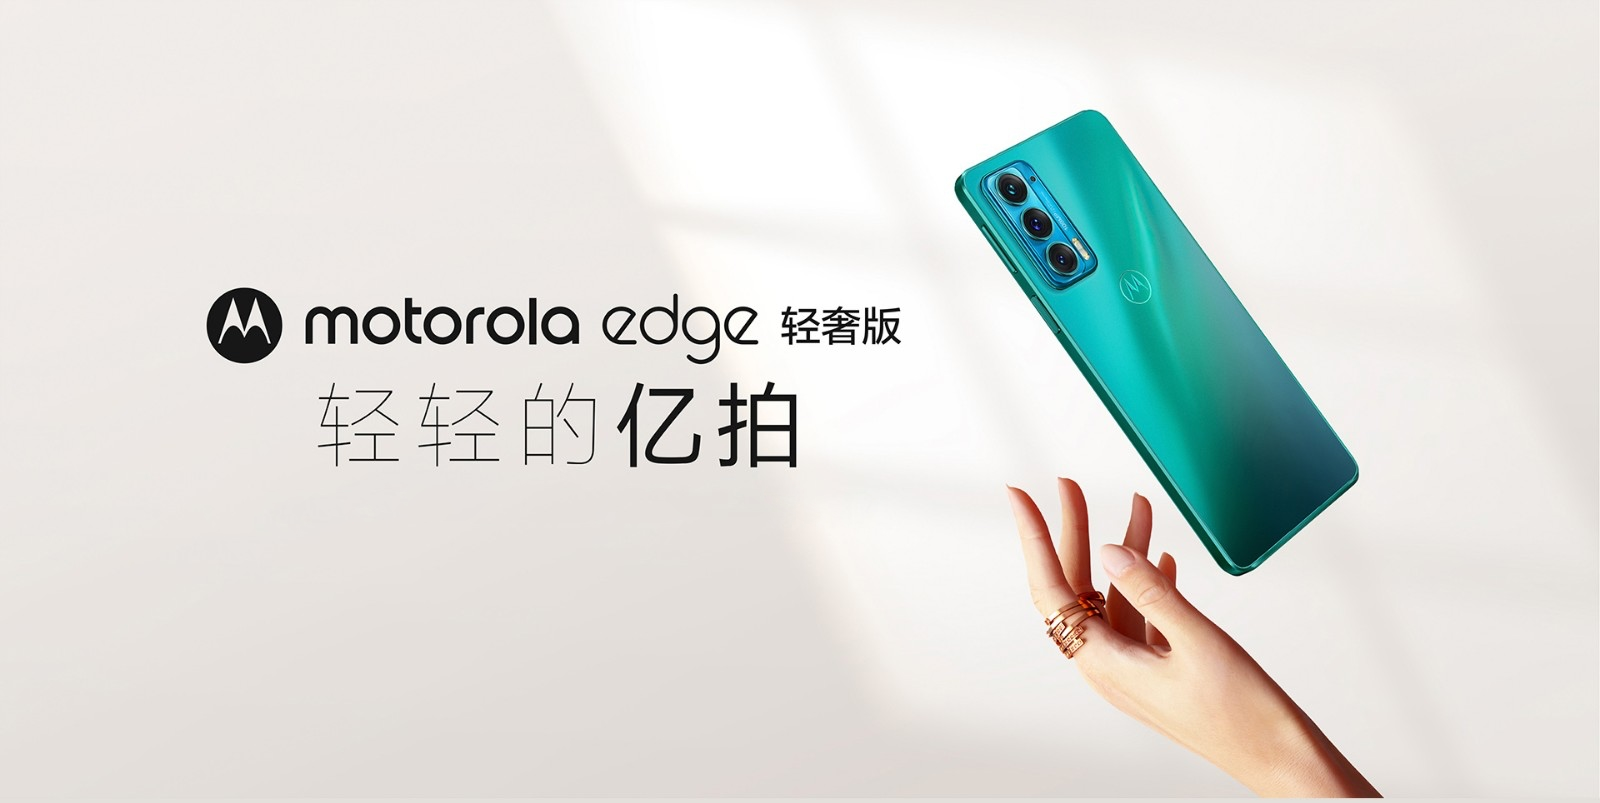 Motorola Edge Lite: OLED-экран на 144 Гц, чип Snapdragon 778G и корпус с толщиной 6.9 мм за $400